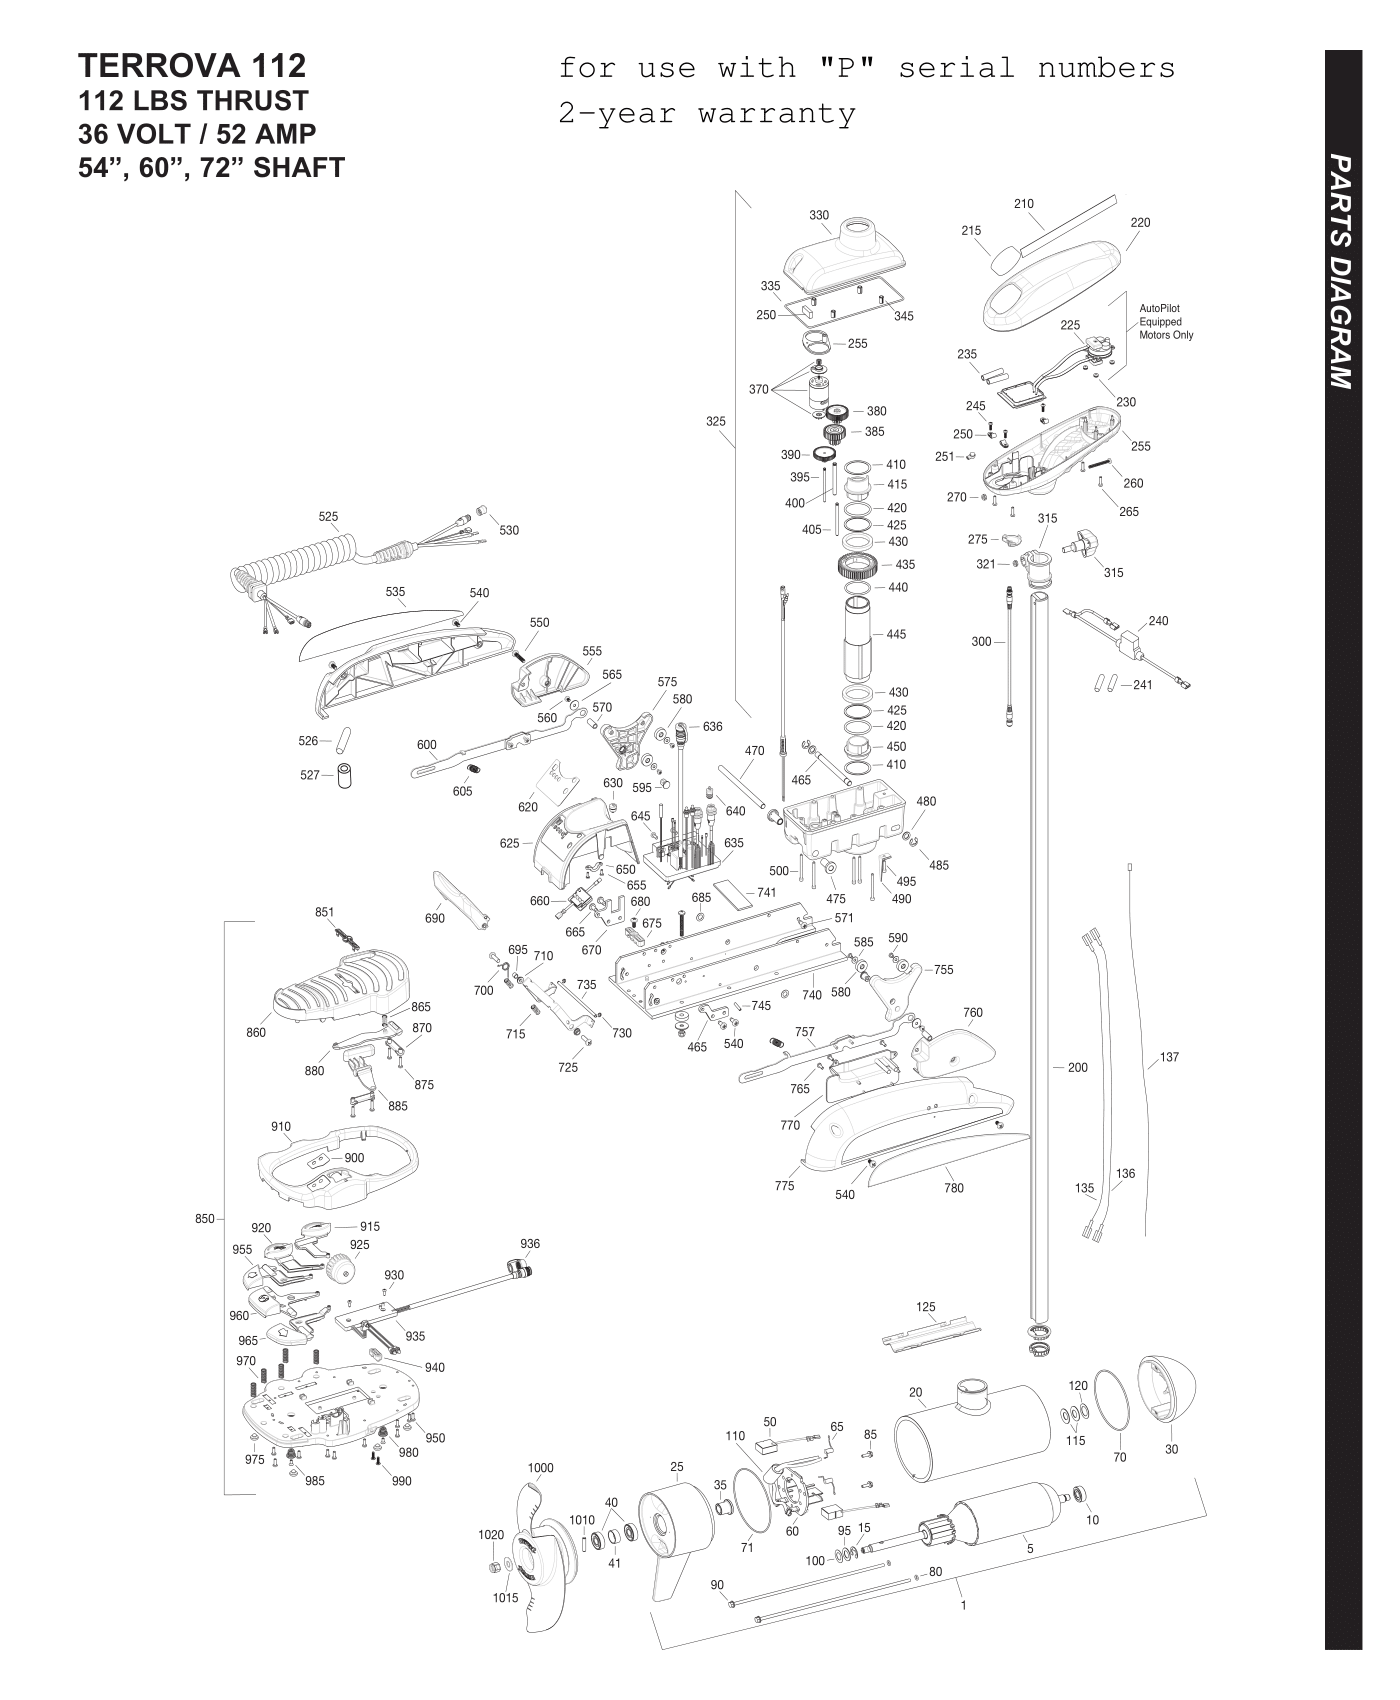 Battery Wiring Diagram For 24 Volt Trolling Motor